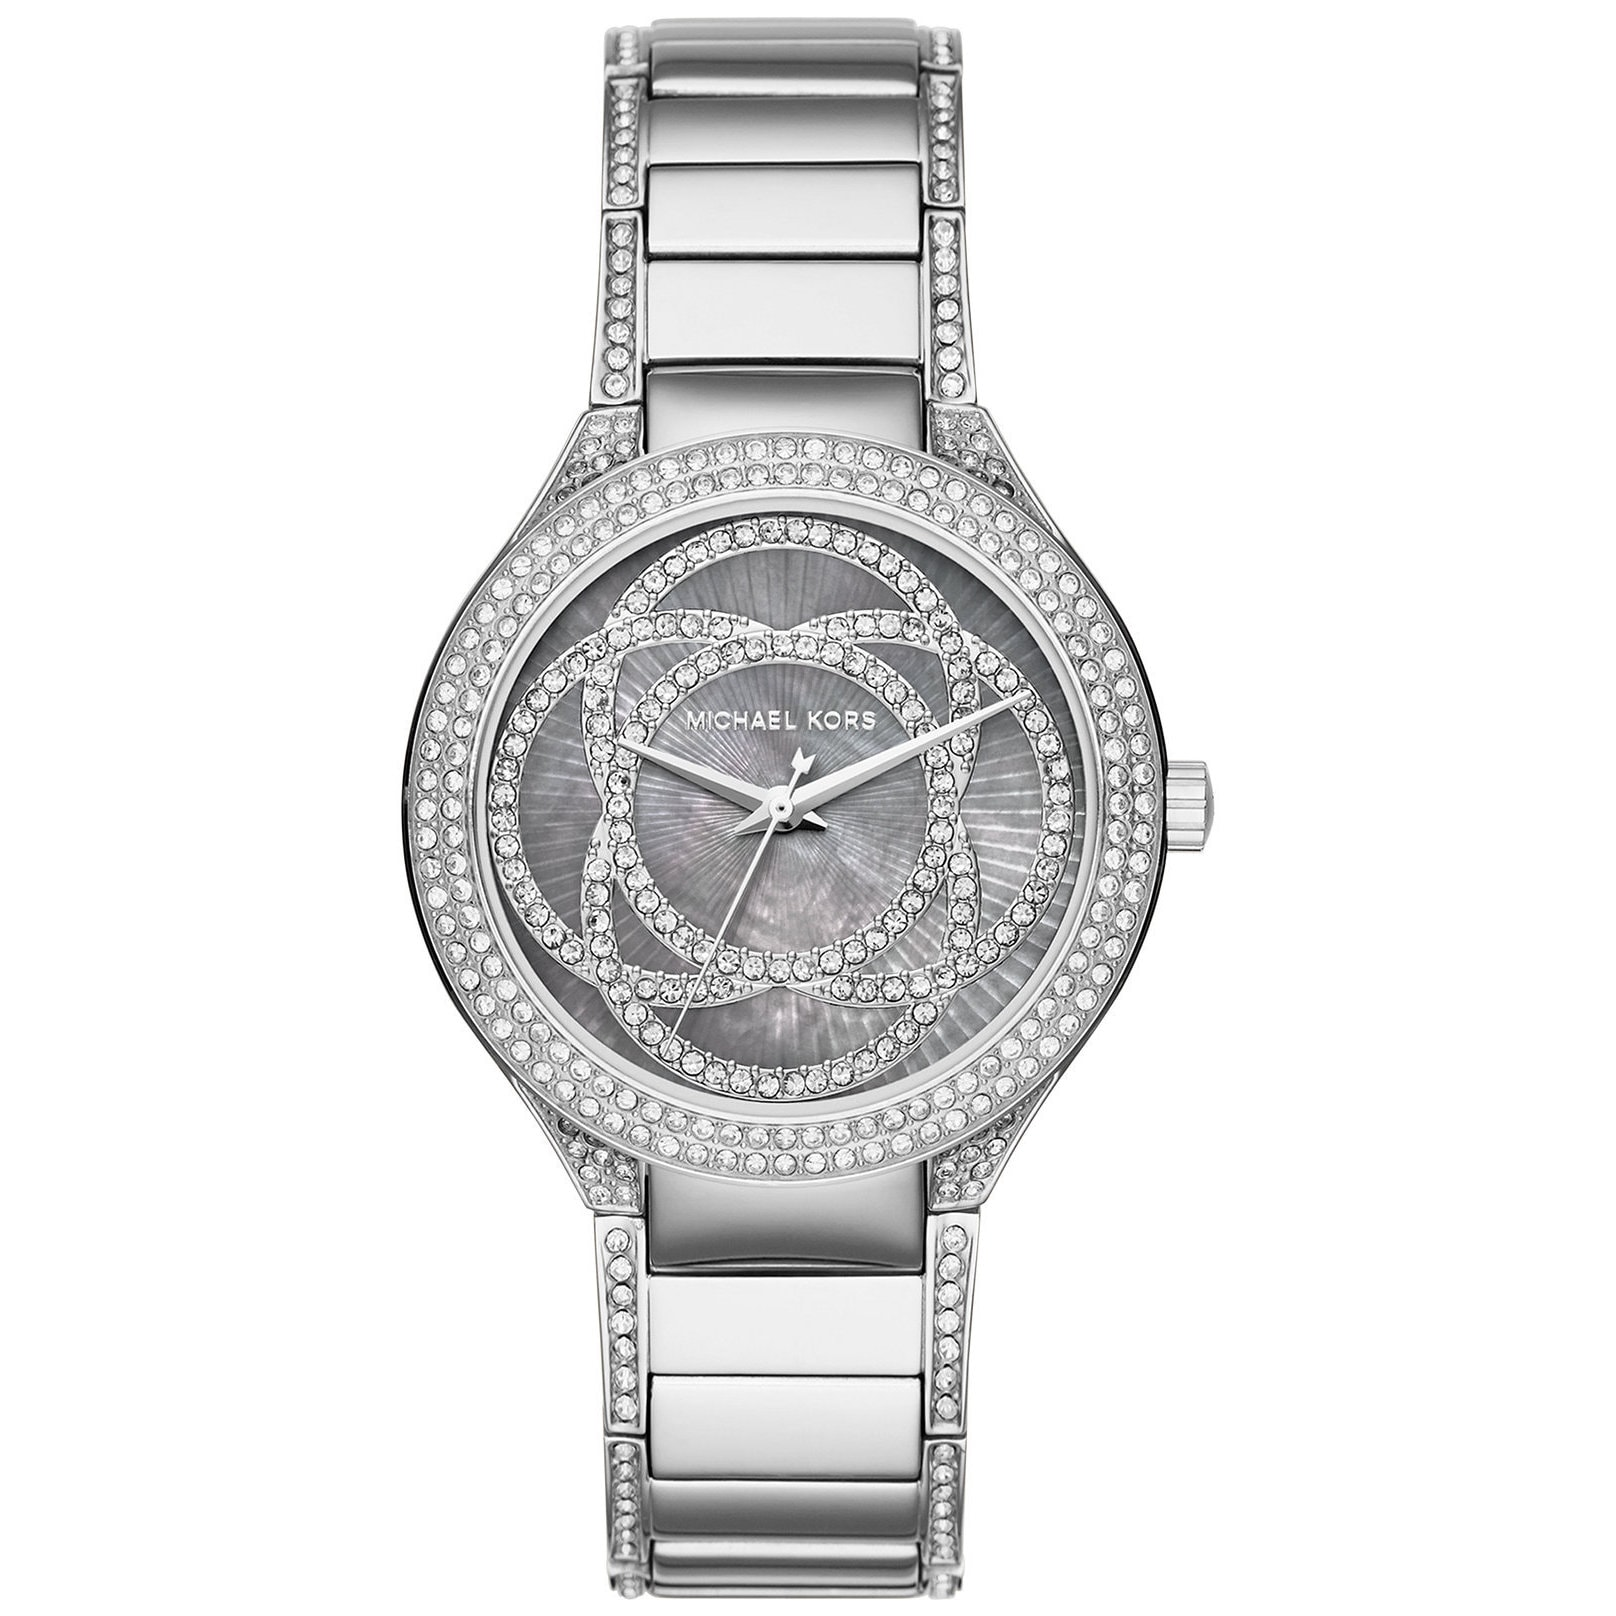 Michael Kors Womens  Kerry Grey Mother Of Pearl Dial Stainless Steel Bracelet Watch MK3480